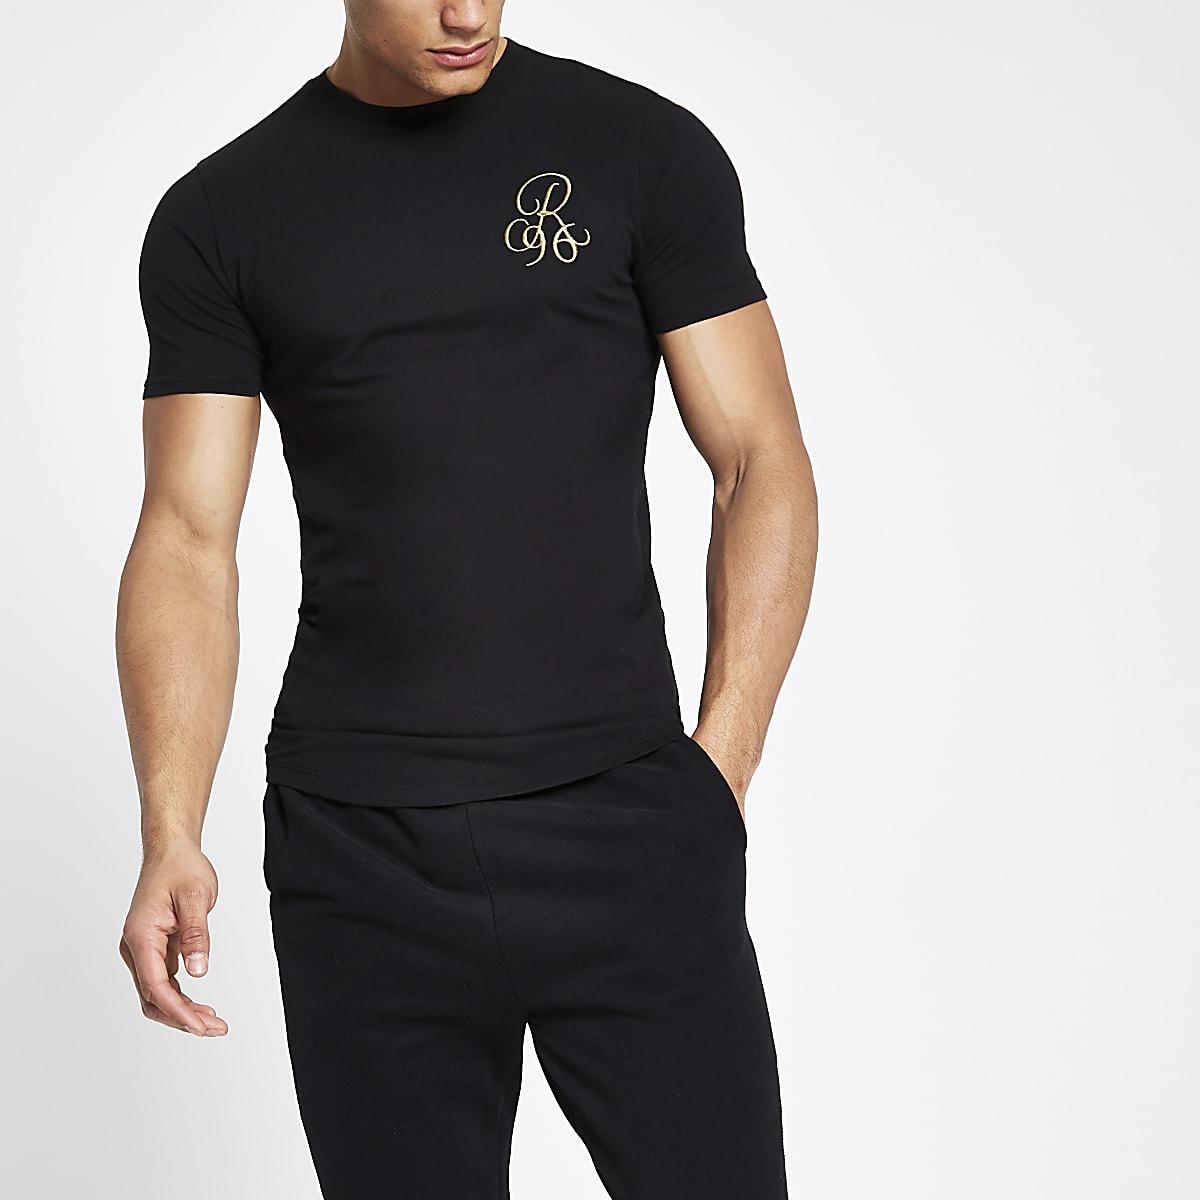 8552bdcecef Black R96 muscle fit T-shirt